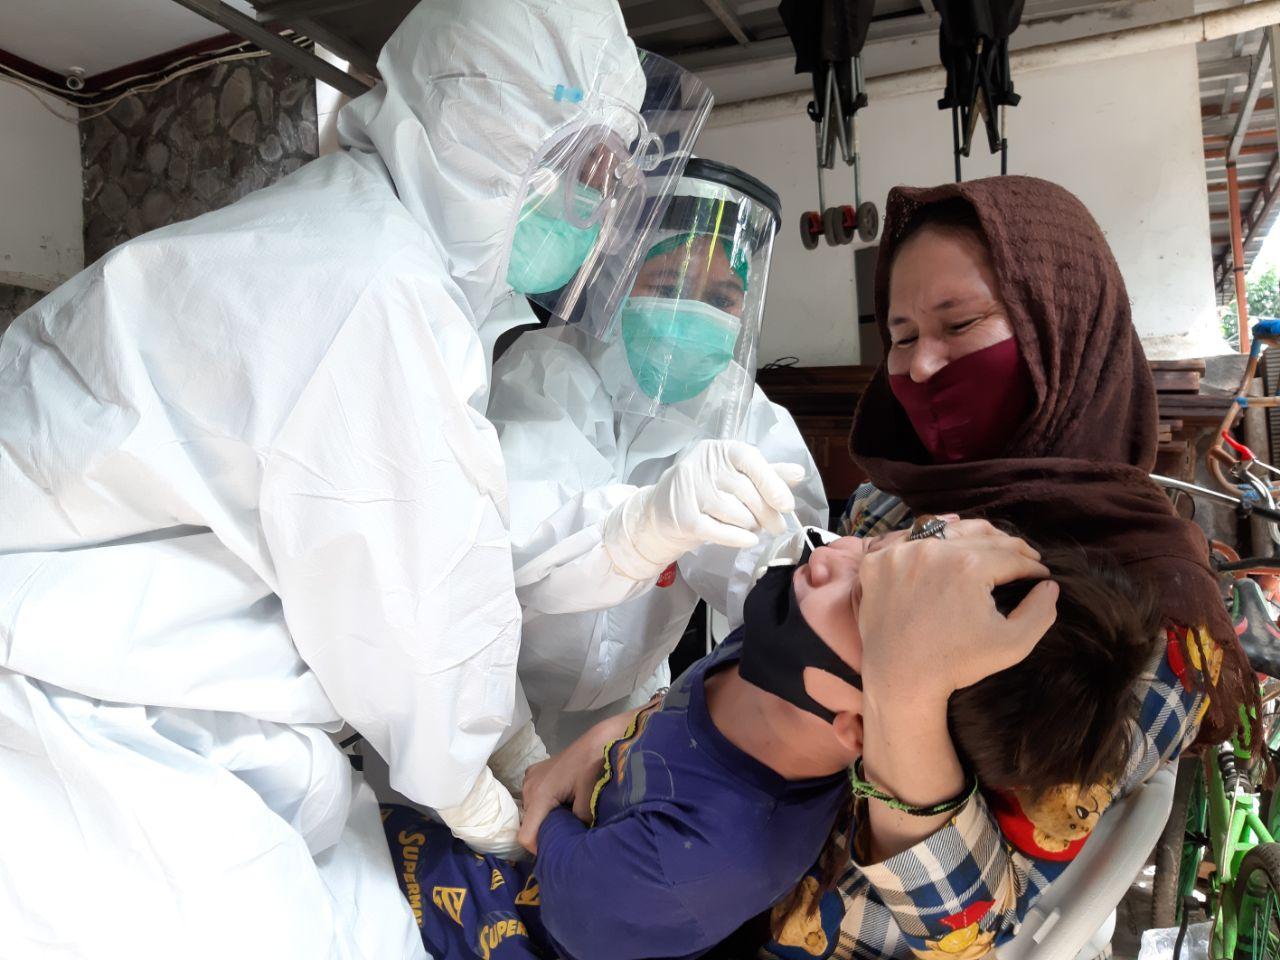 Petugas medis saat menjalani tes usap atau swab test terhadap warga negara asing (WNA) di wilayah Kelurahan Isangan, Kecamatan Ciputat Timur, Tangerang Selatan, Rabu (28/10/2020).